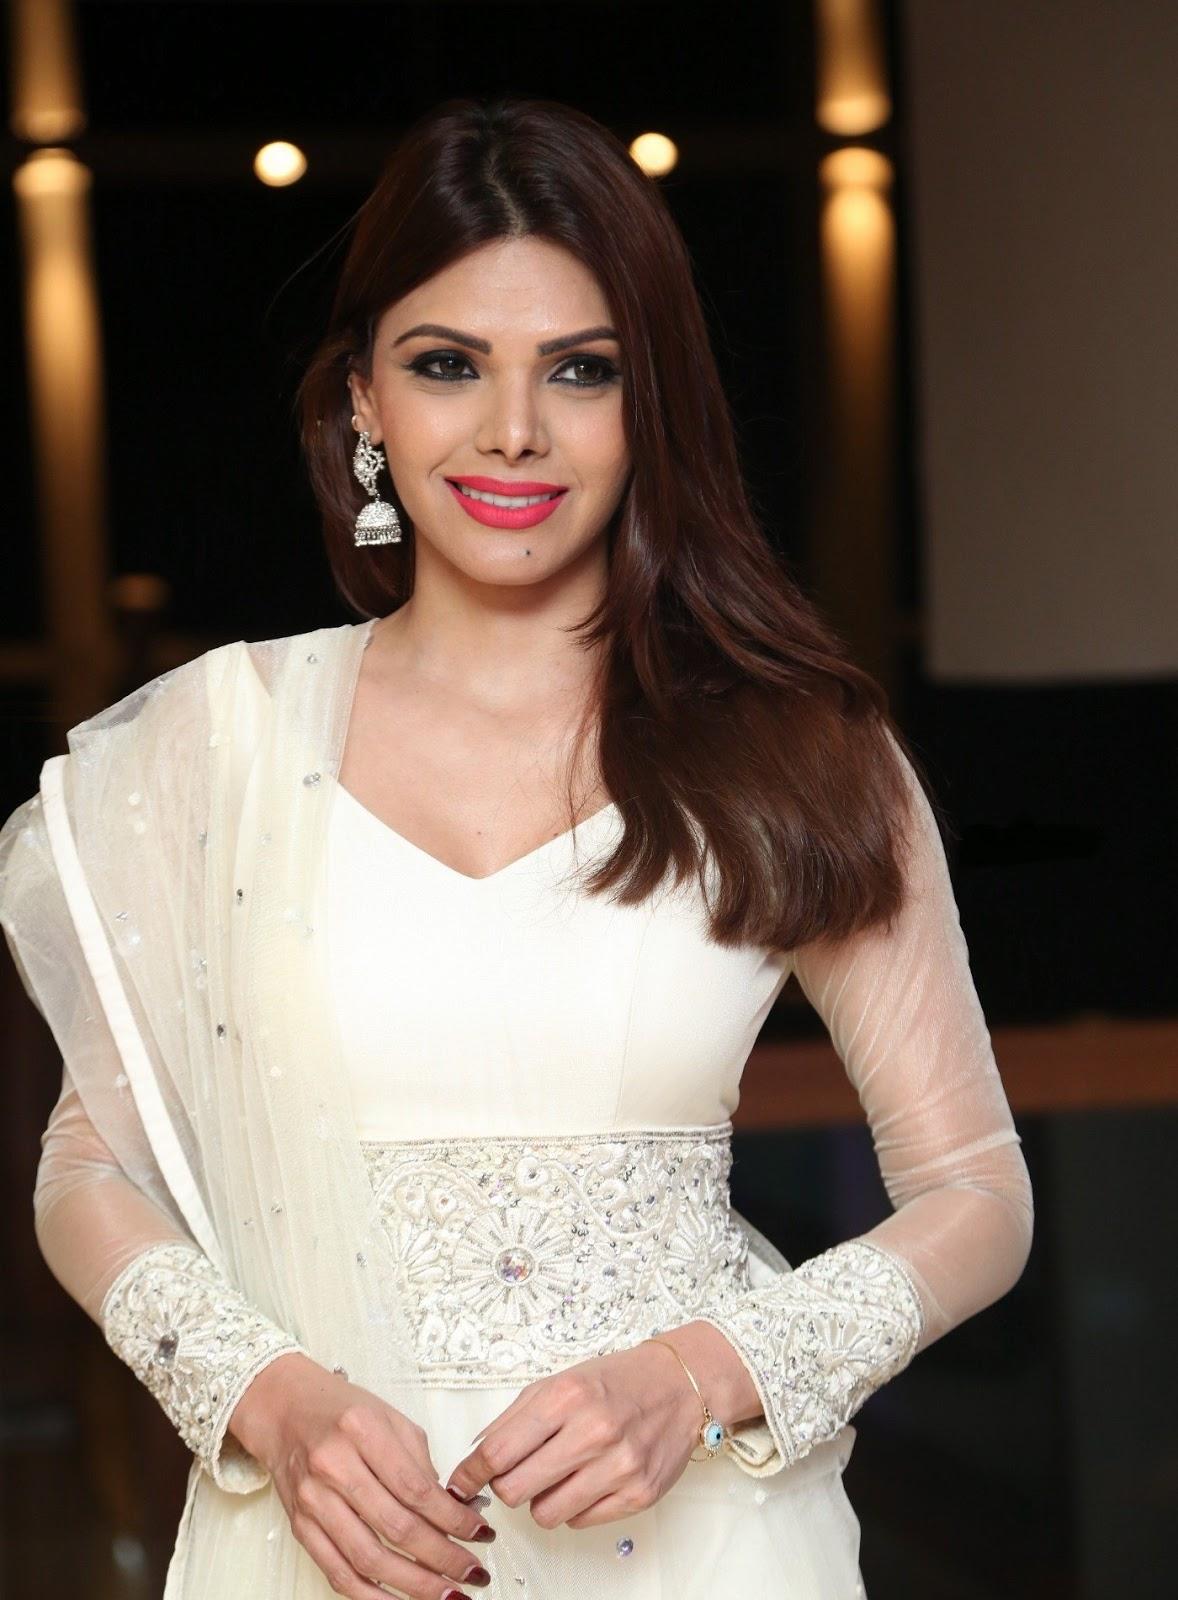 Sherlyn Chopra Looks Super Hot In White Dress At Dj Inayah -8276